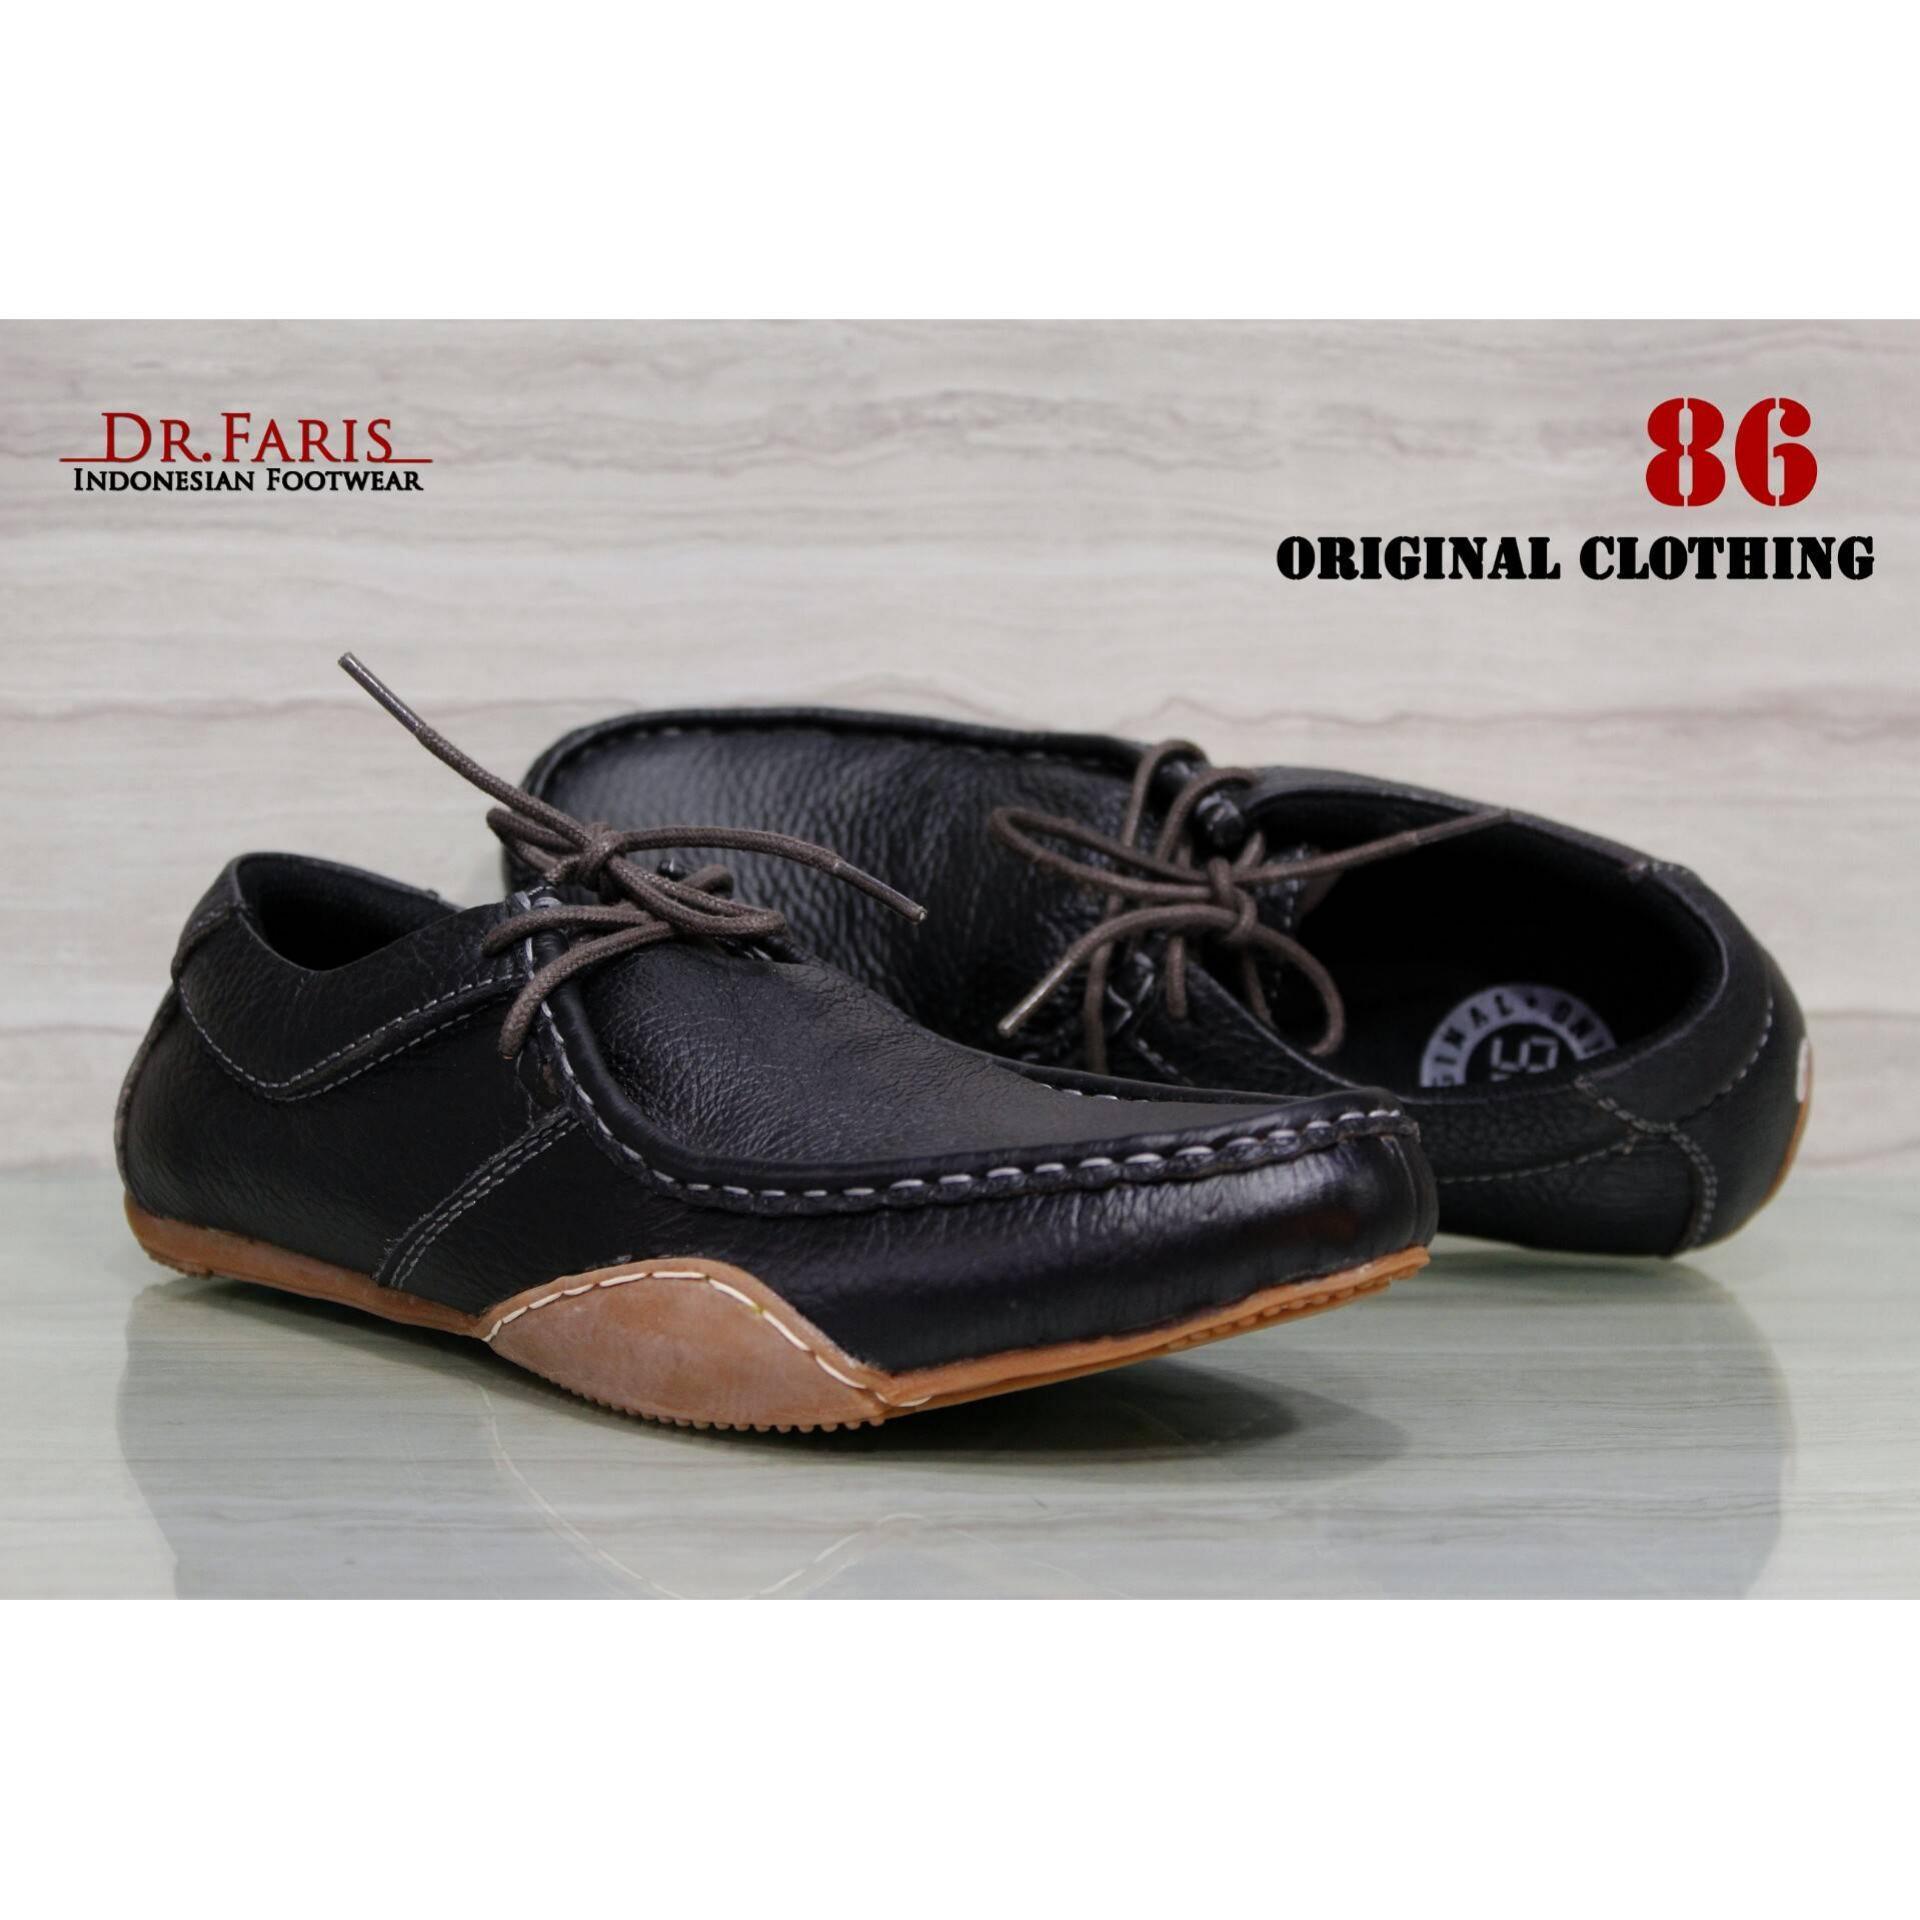 Sepatu Kulit Asli Casual Pria 86 FERARI TALI Hitam Jual Sepatu Pria Dr  Faris Terbaru ... f25373ad24